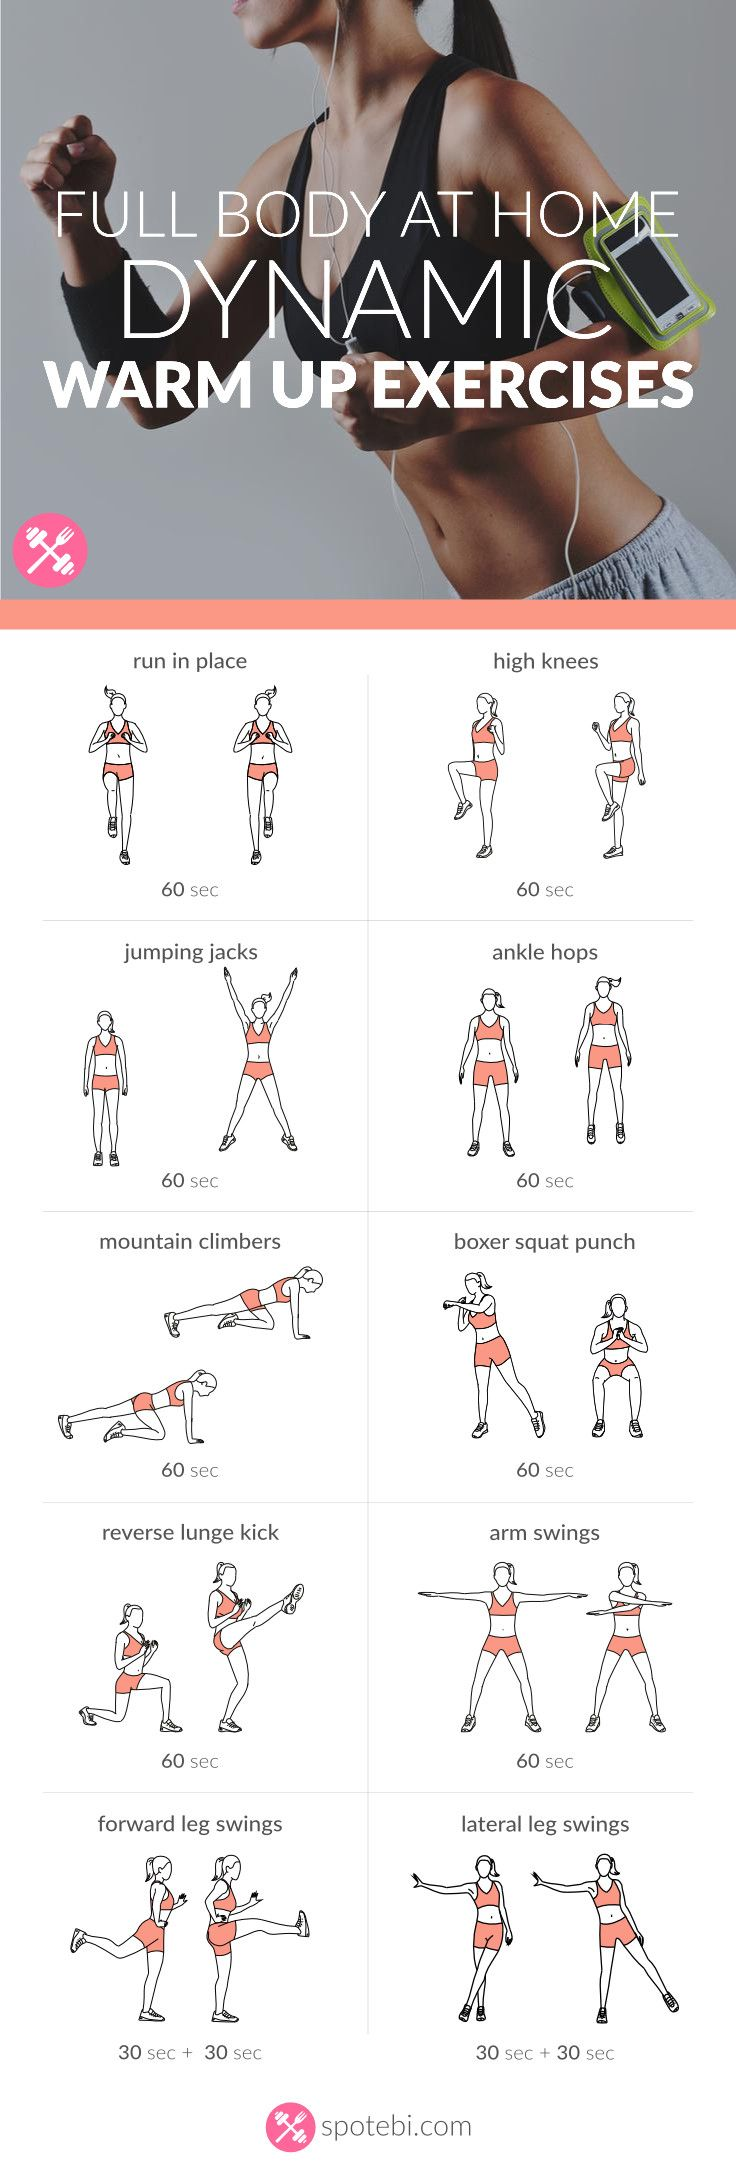 9 Best Home Cardio Exercises 9 Best Home Cardio Exercises new photo